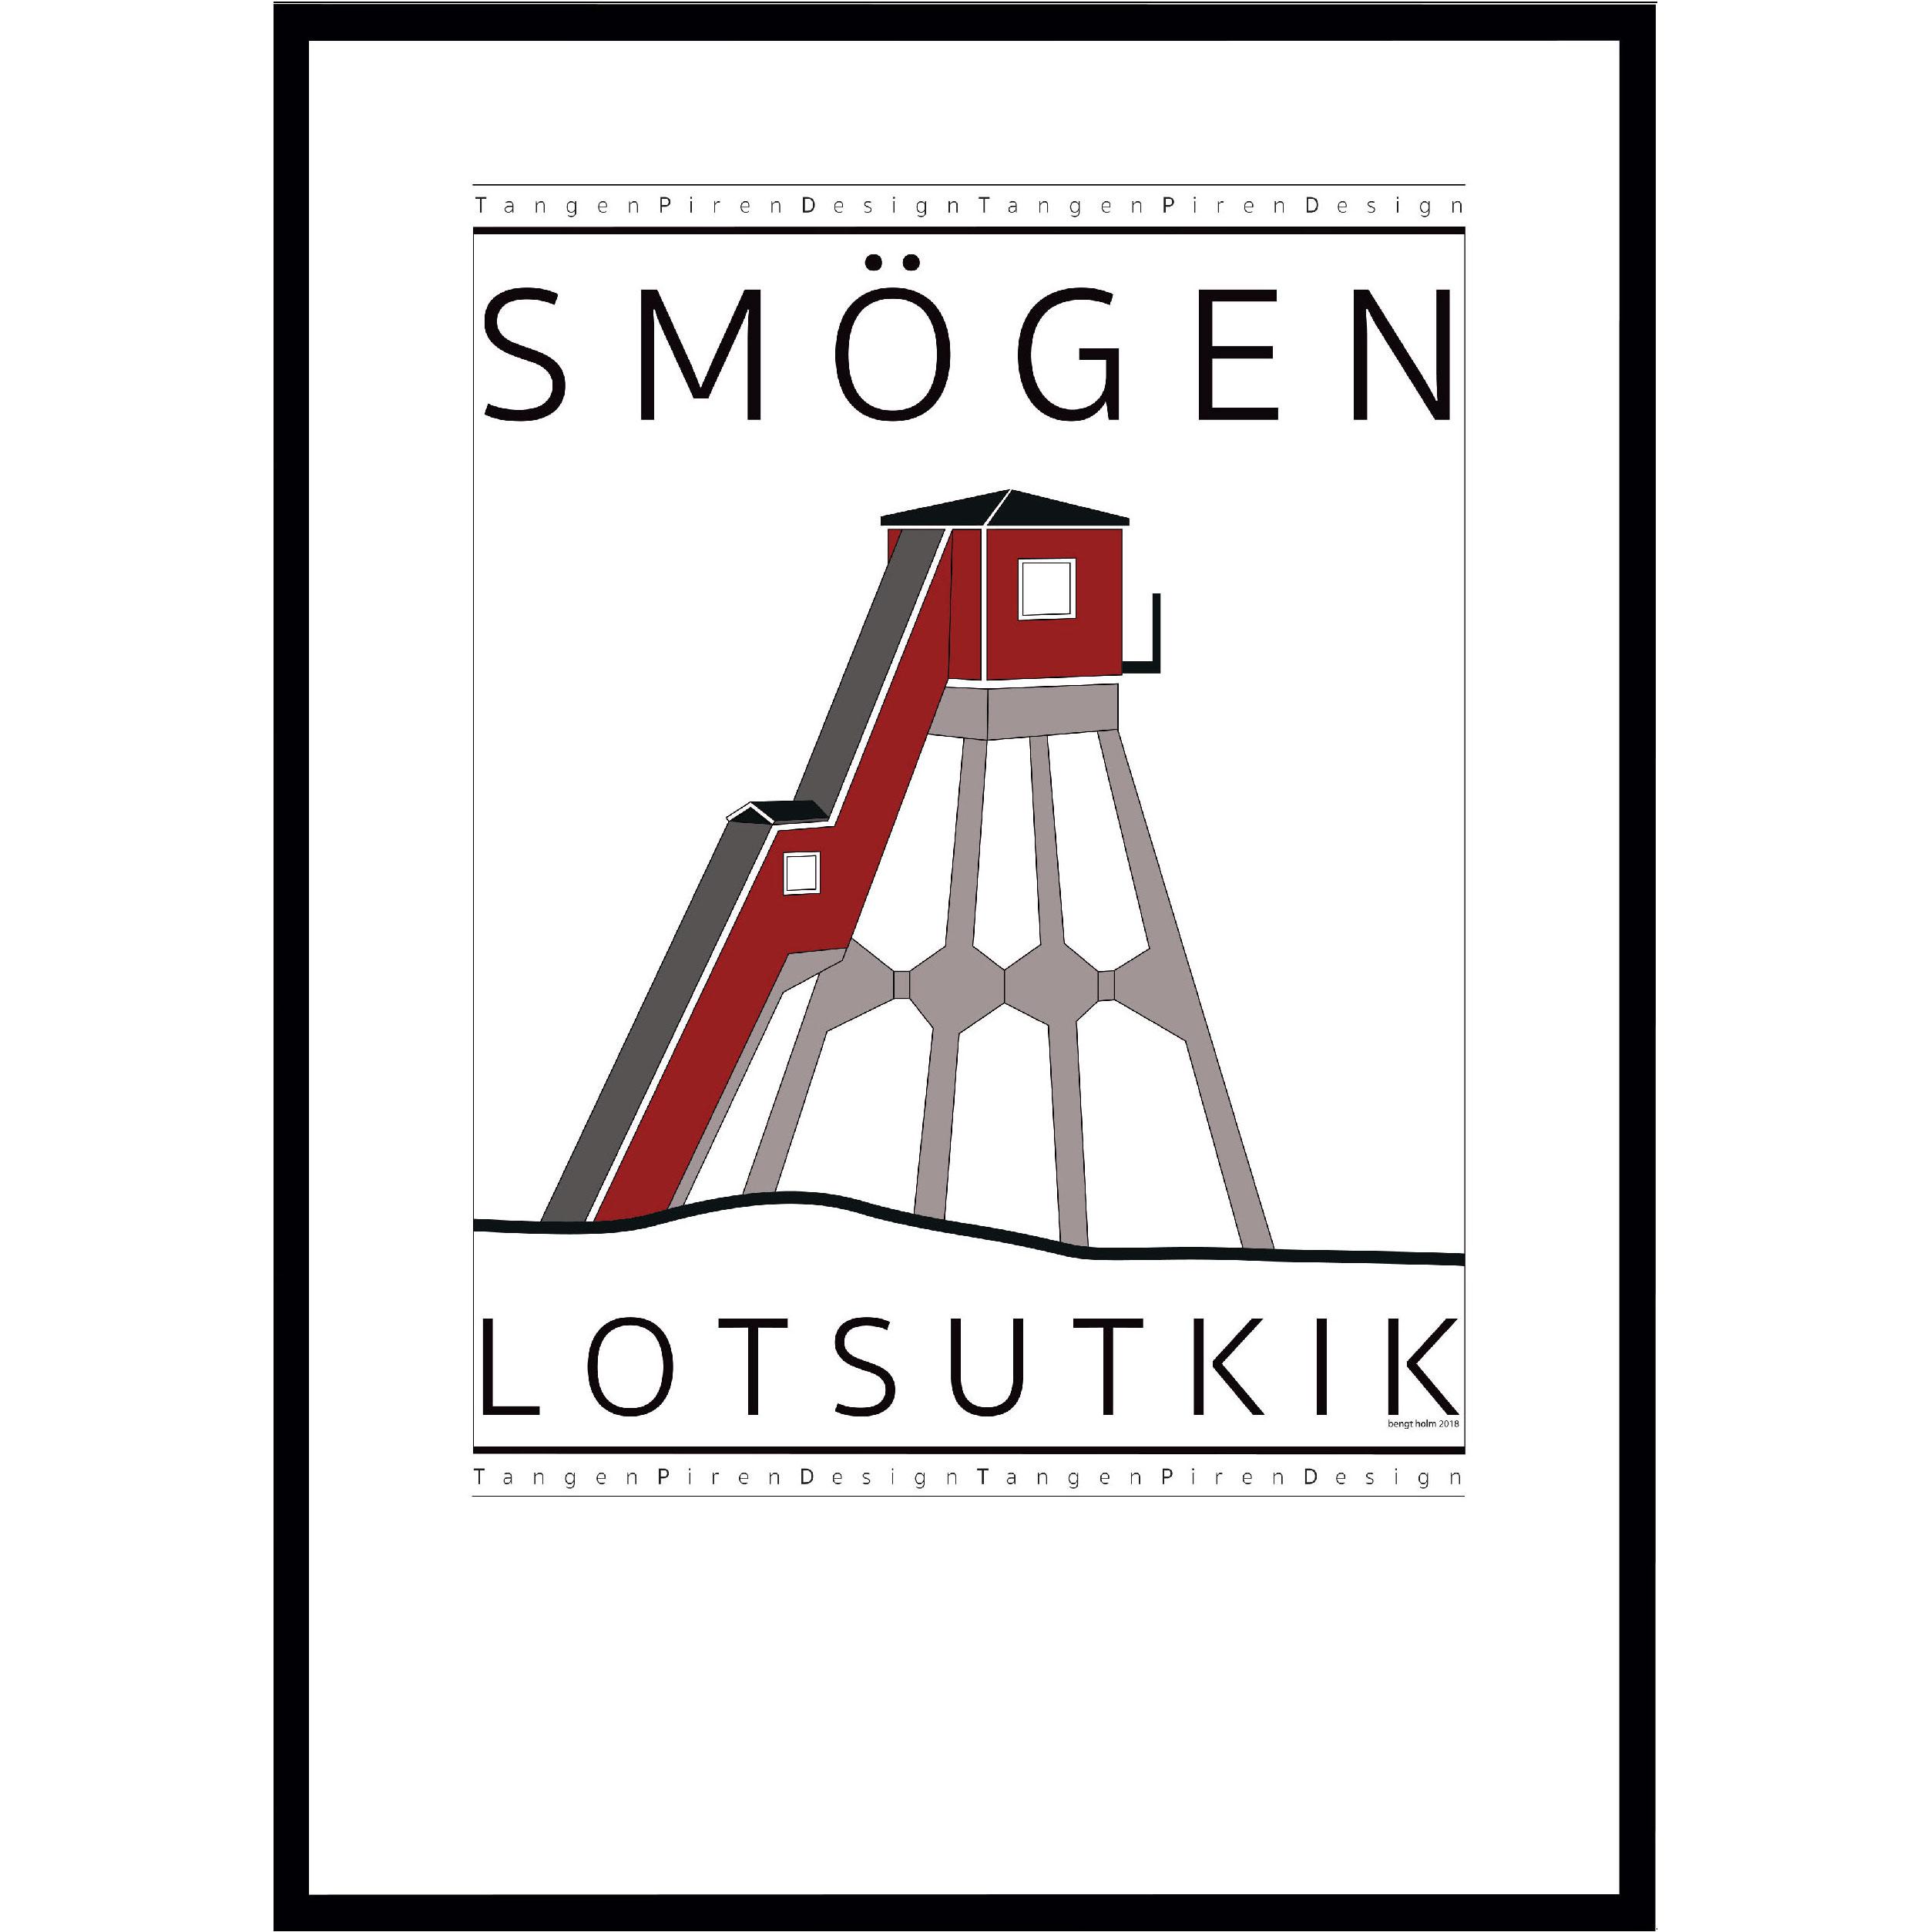 A14 Poster Smögens Lotsutkik